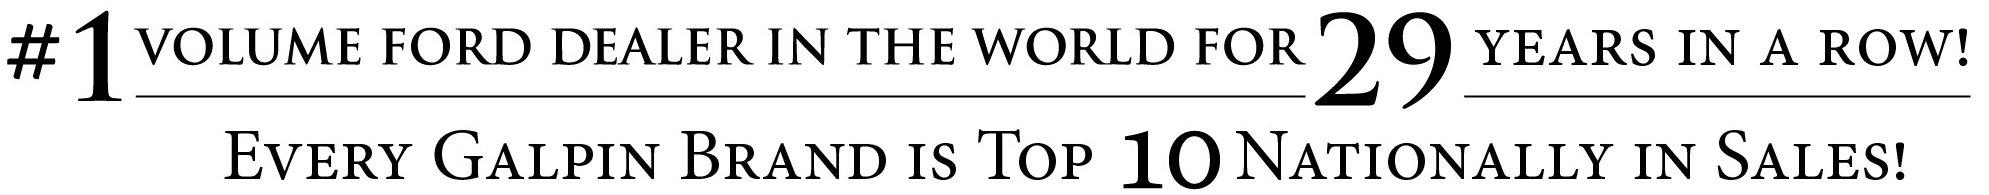 #1 volume ford dealer in the world